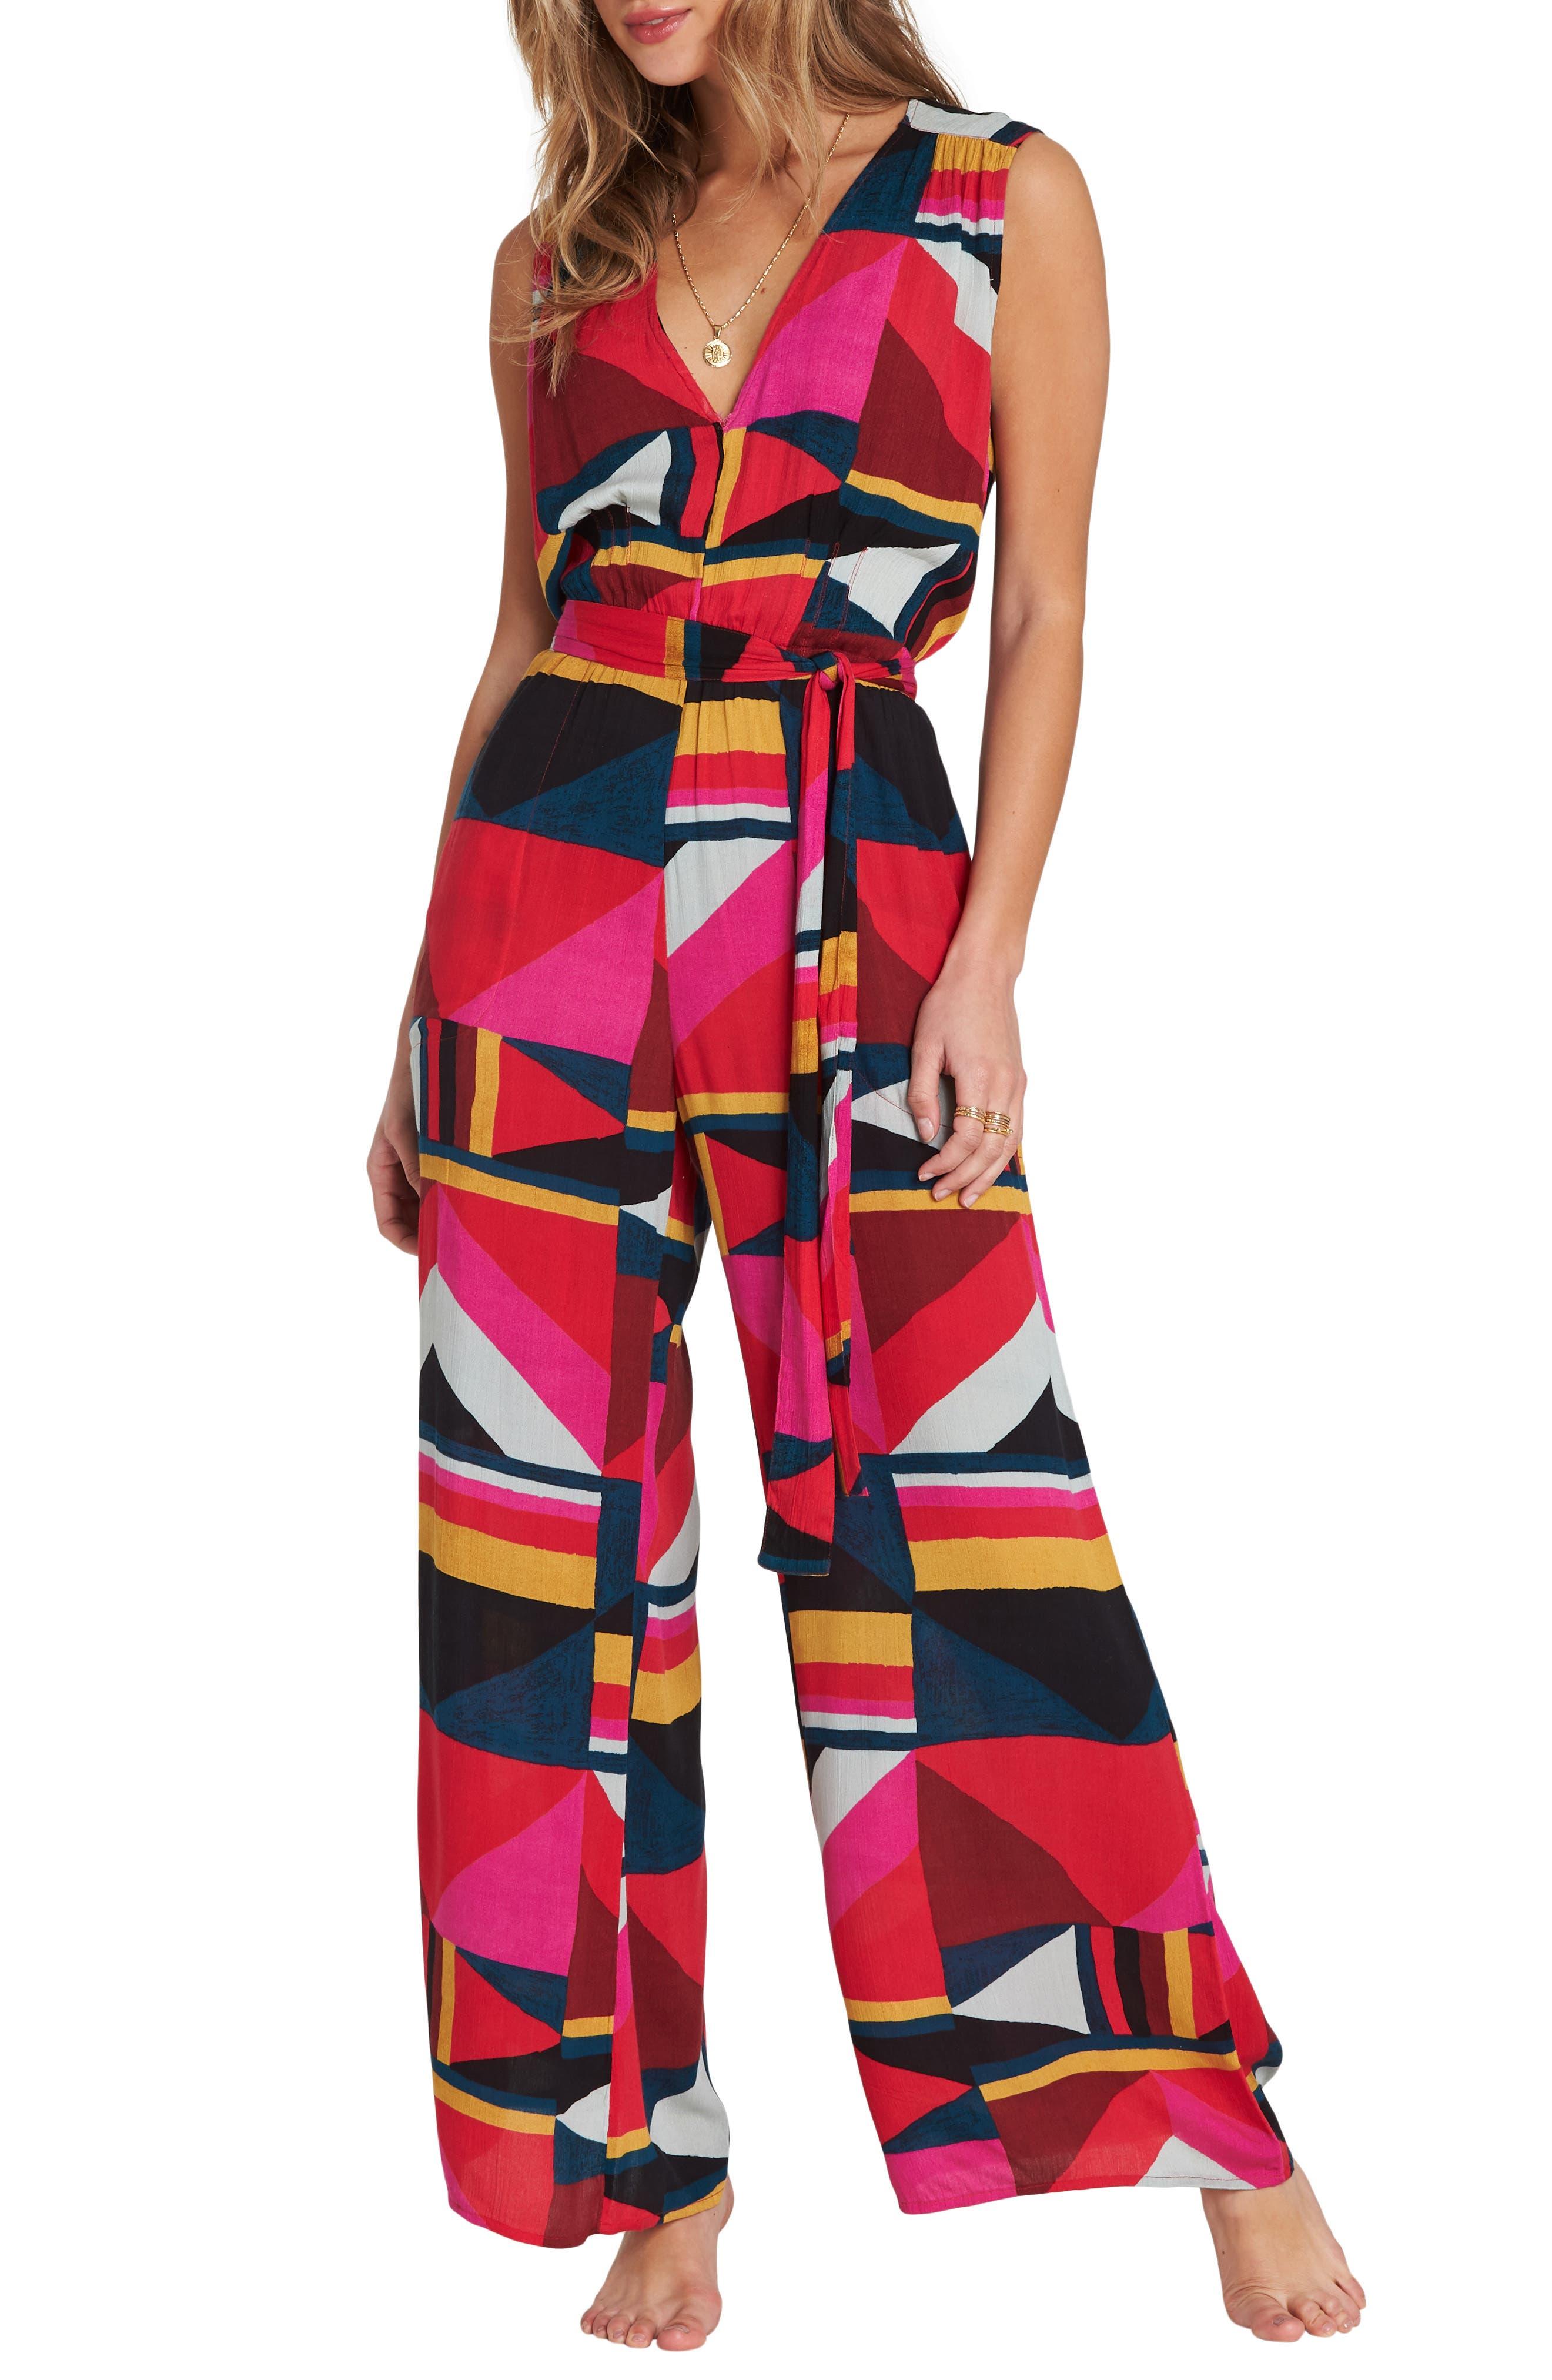 60s – 70s Pants, Jeans, Hippie, Bell Bottoms, Jumpsuits Womens Billabong Seeing Tricks Jumpsuit Size Large - Red $59.95 AT vintagedancer.com